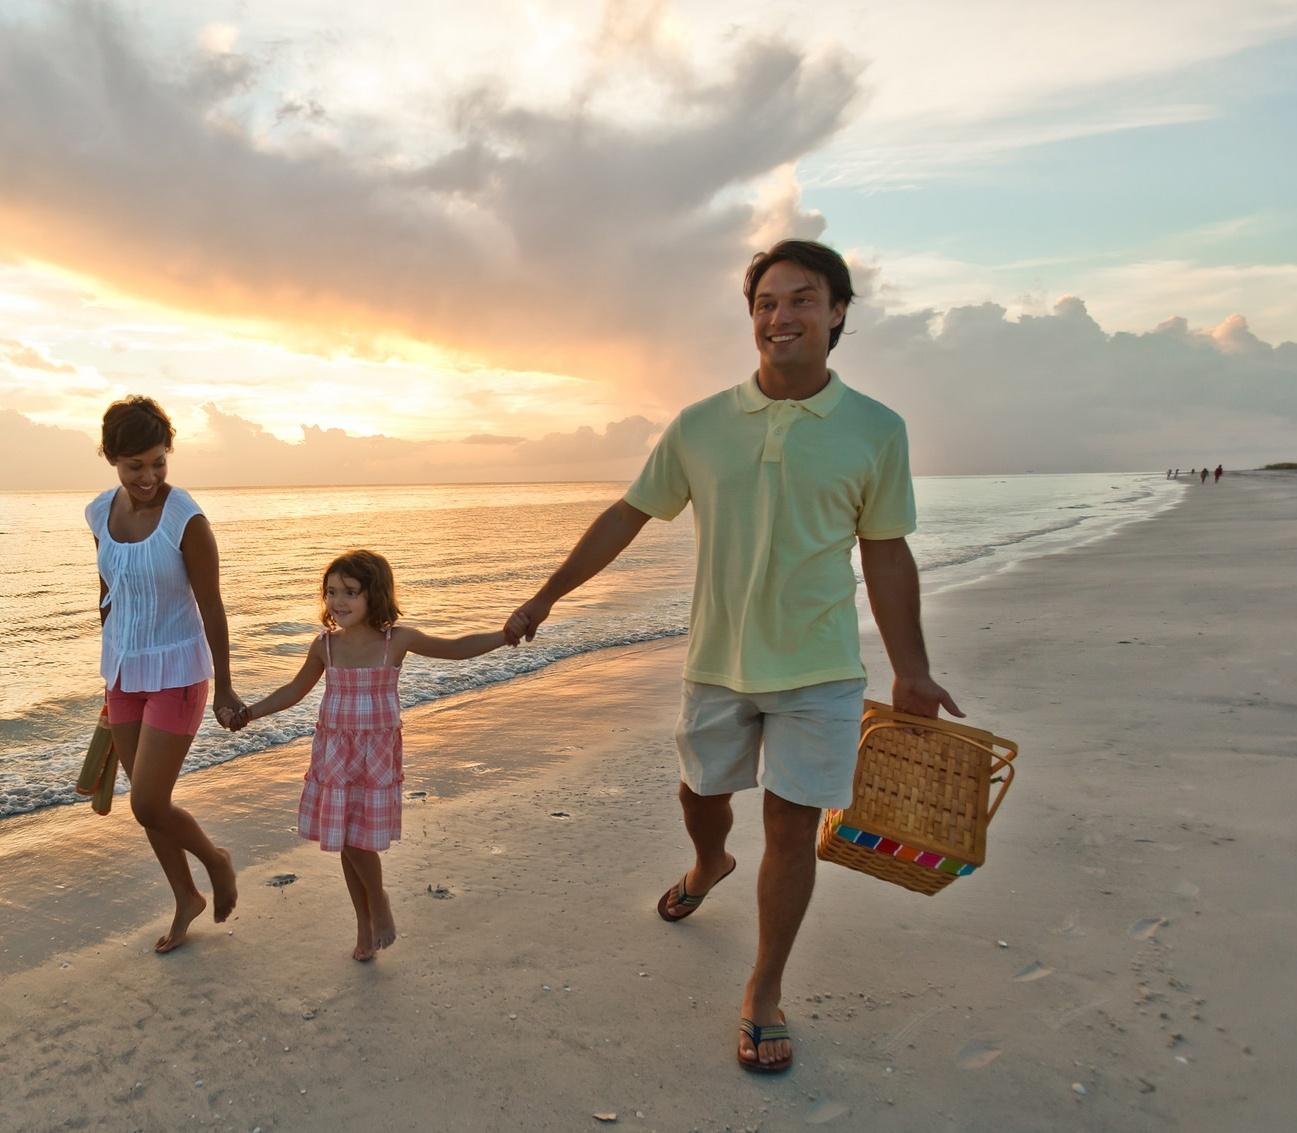 family - walking - persona - beach - summer - kid - picnic - ocean- blog post.jpg